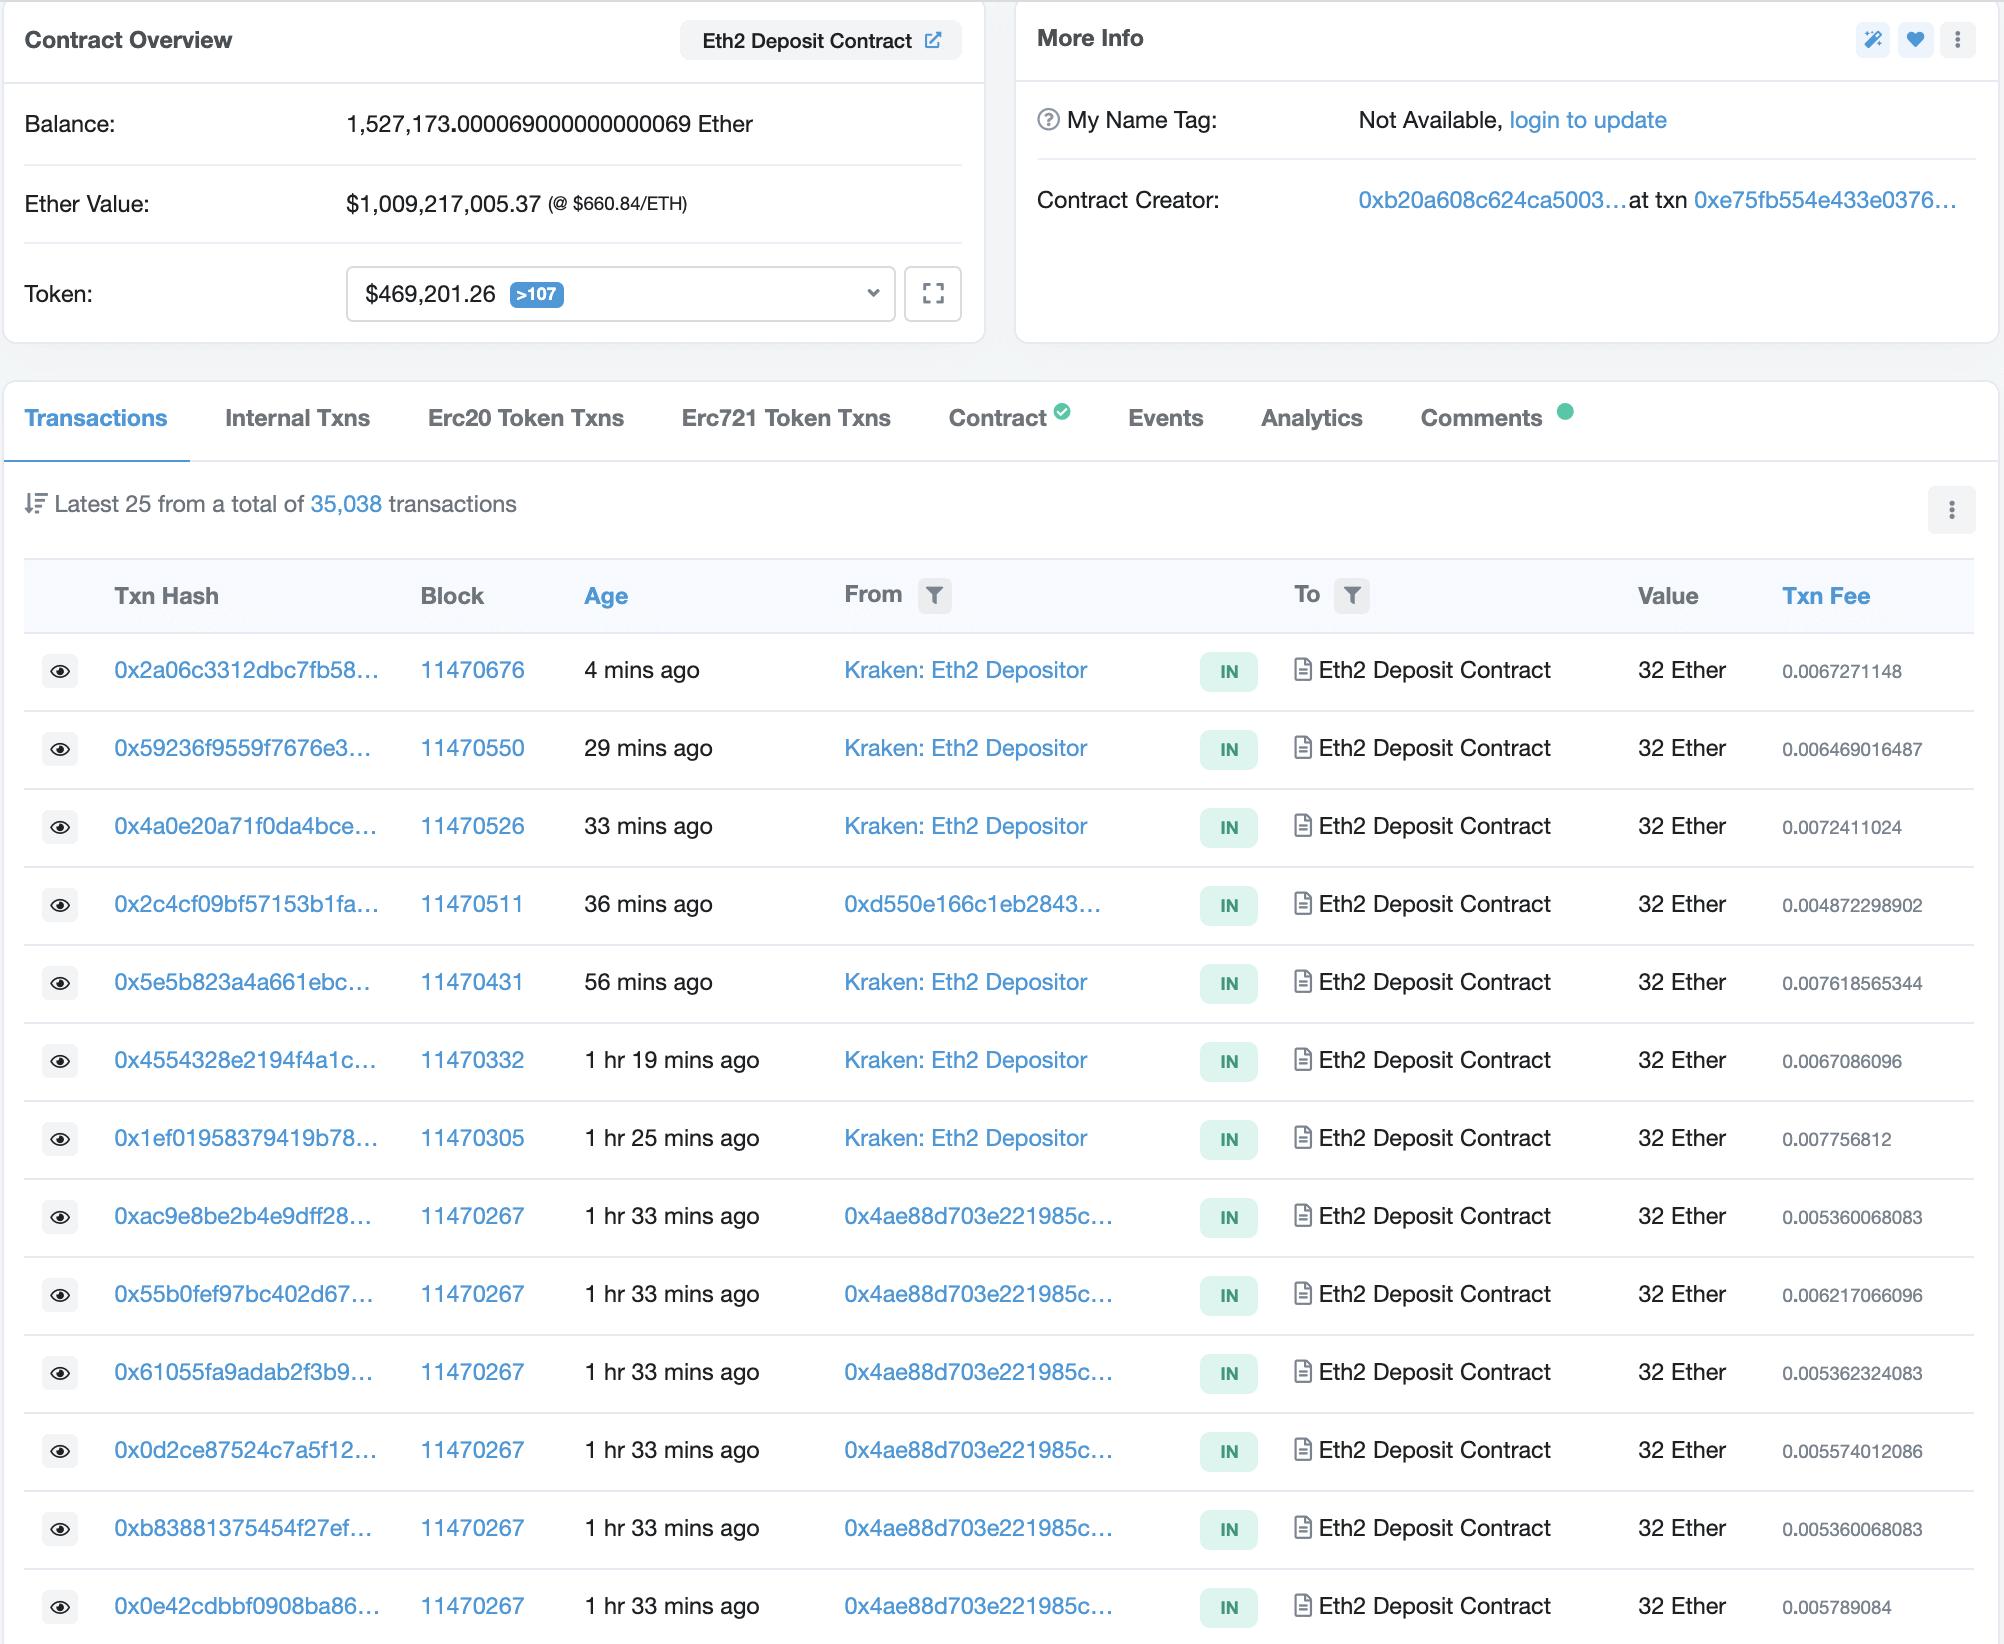 Ethereum 2.0 deposits surpass $1 billion, Dec 2020